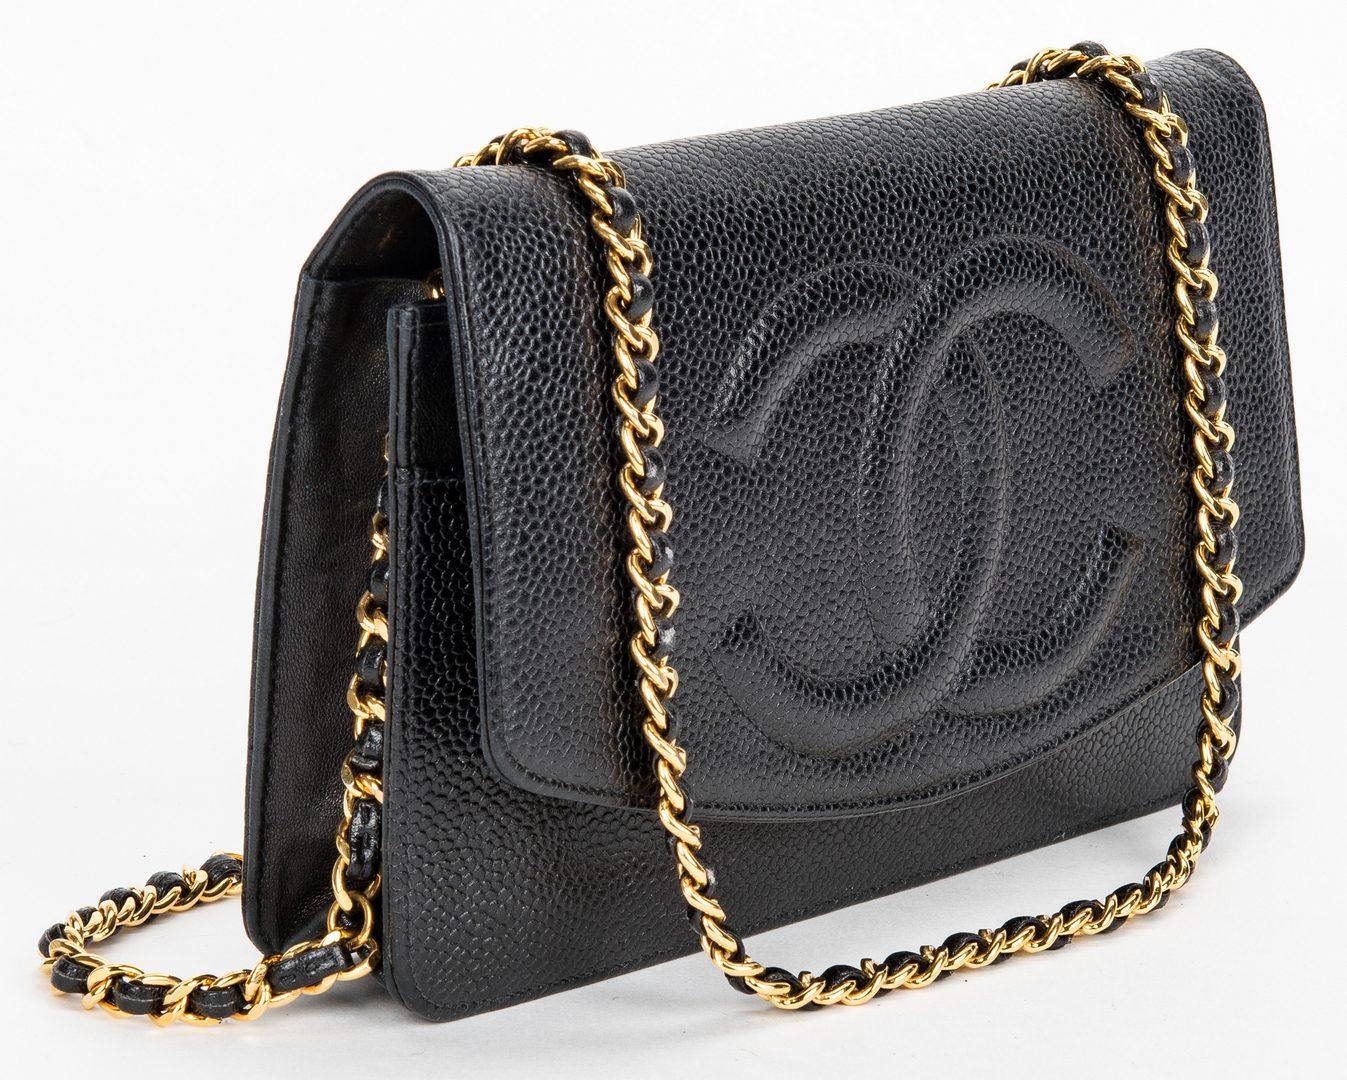 Lot 753: Chanel Caviar Wallet/Crossbody on Chain